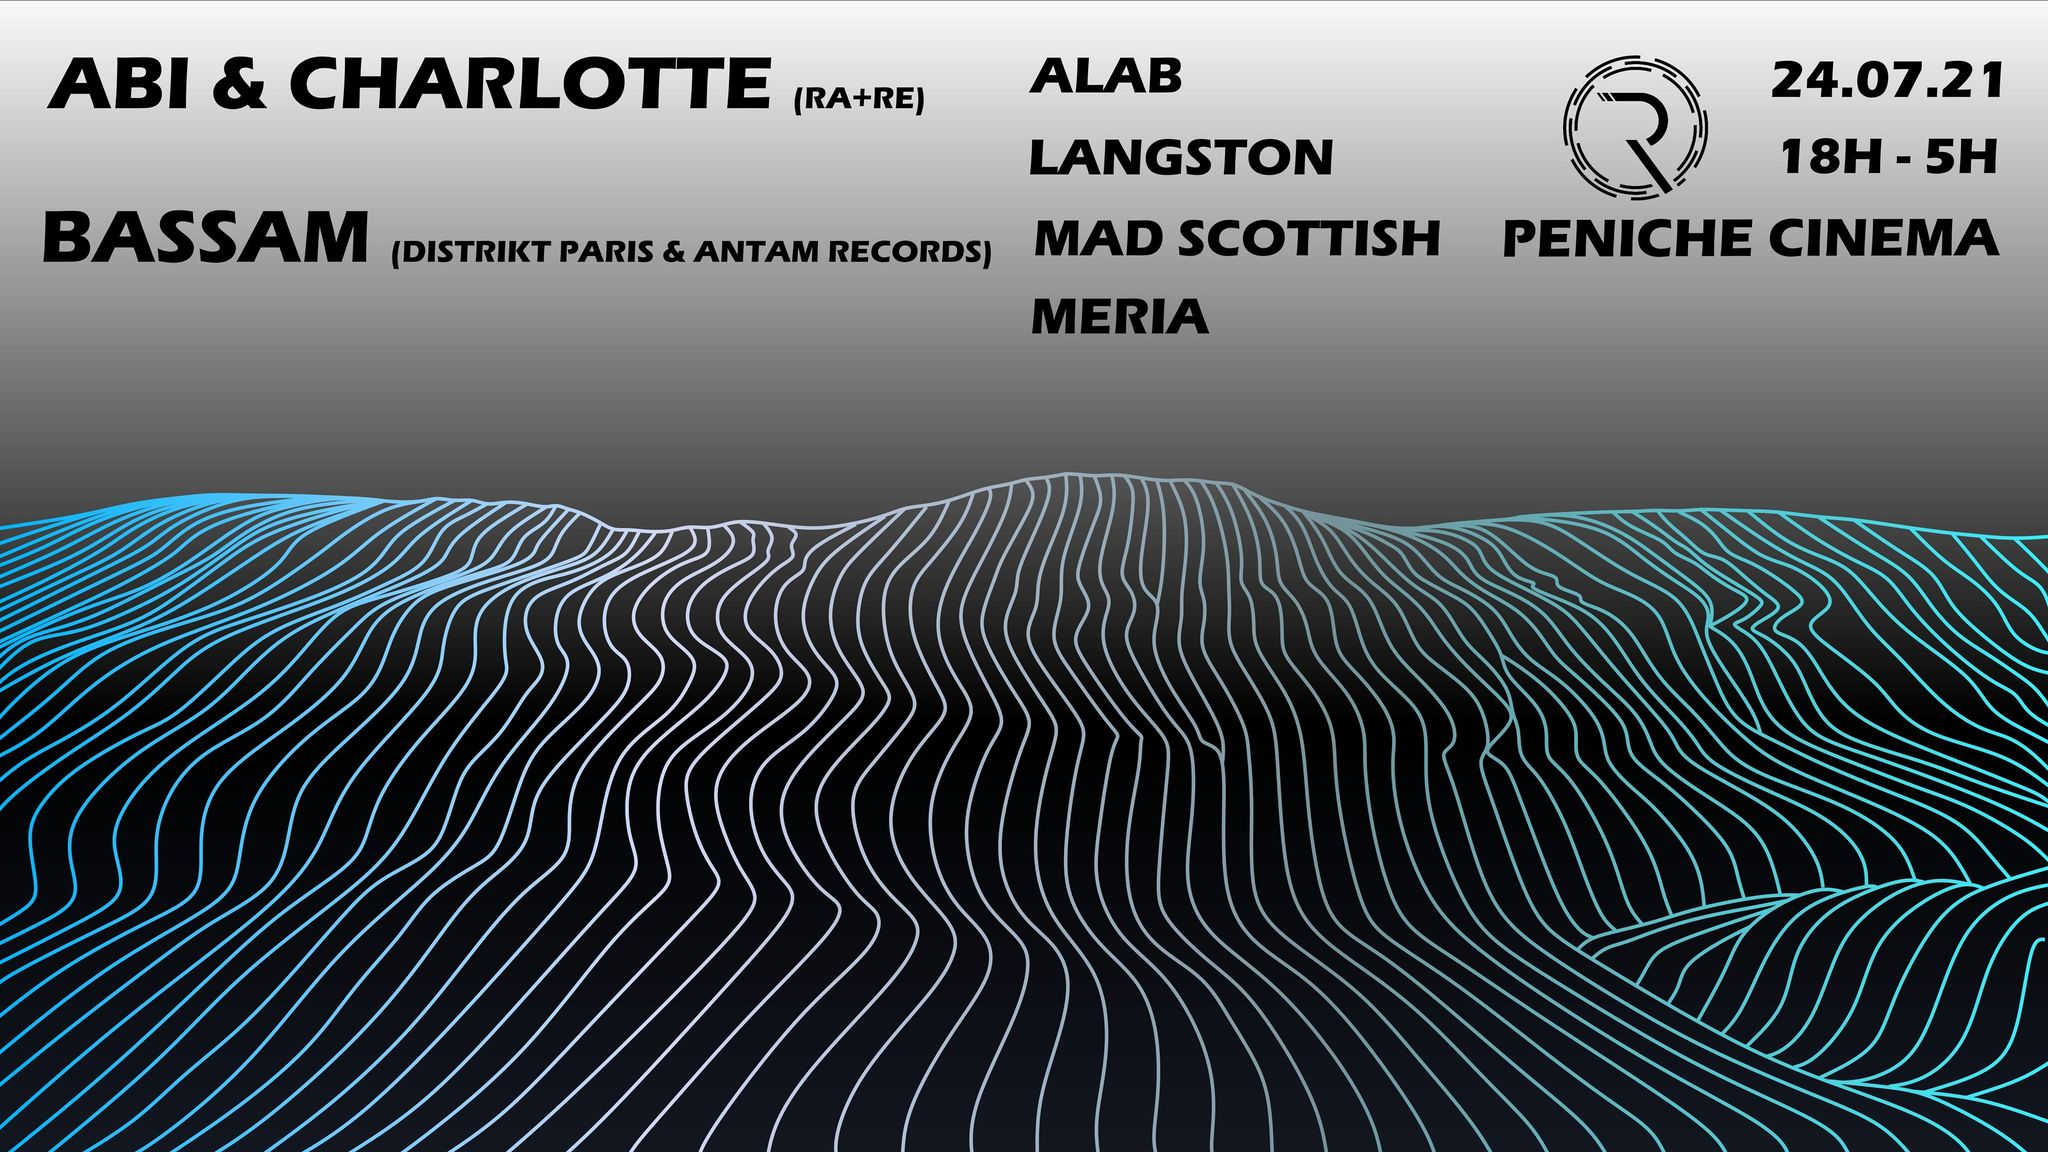 Quatre Records invite ABI & Charlotte (RA+RE), Bassam (Distrikt Paris)